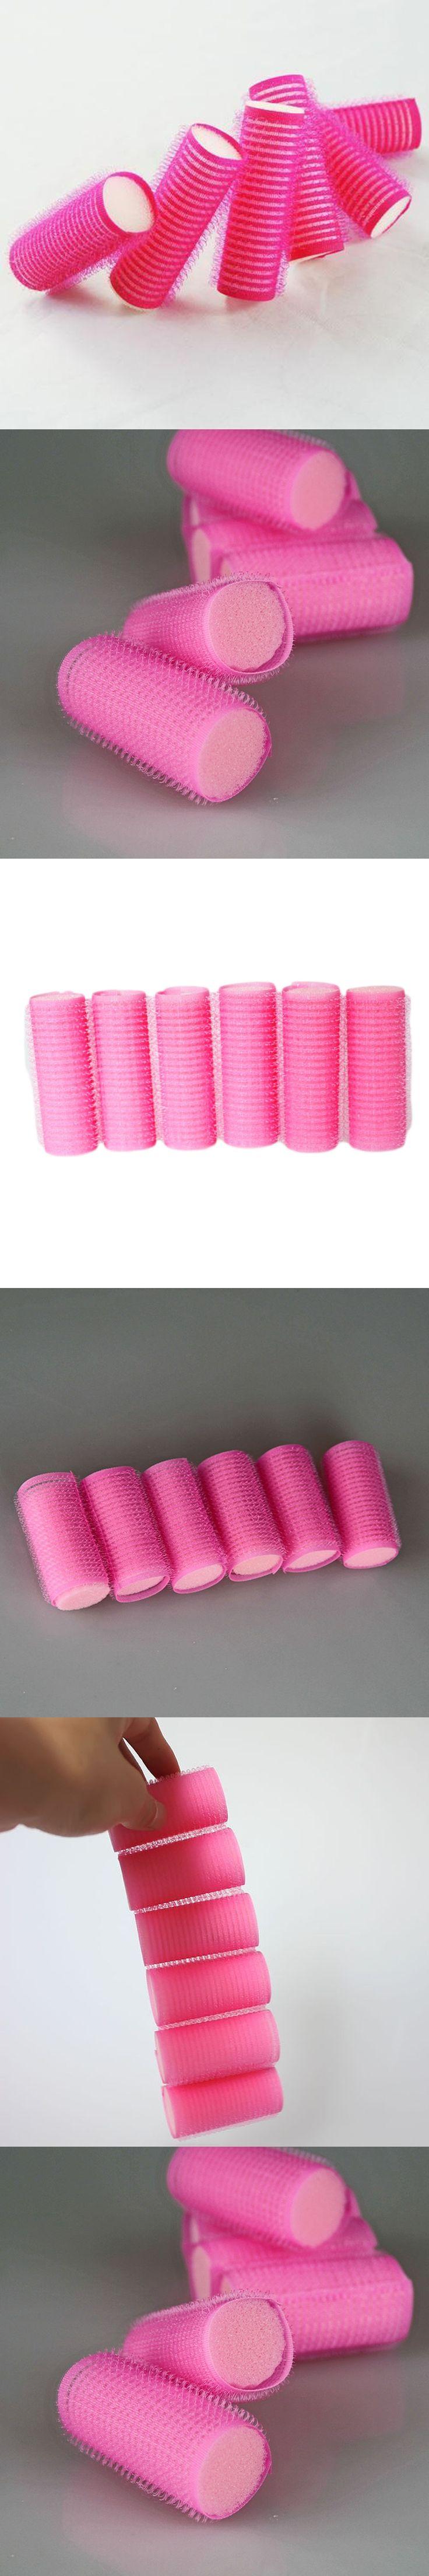 1set Curler Roller Grip Hair Roller DIY Hair Curler Sponge Self Grip Hairdressing Rollers Hair Styling Tools For Salon